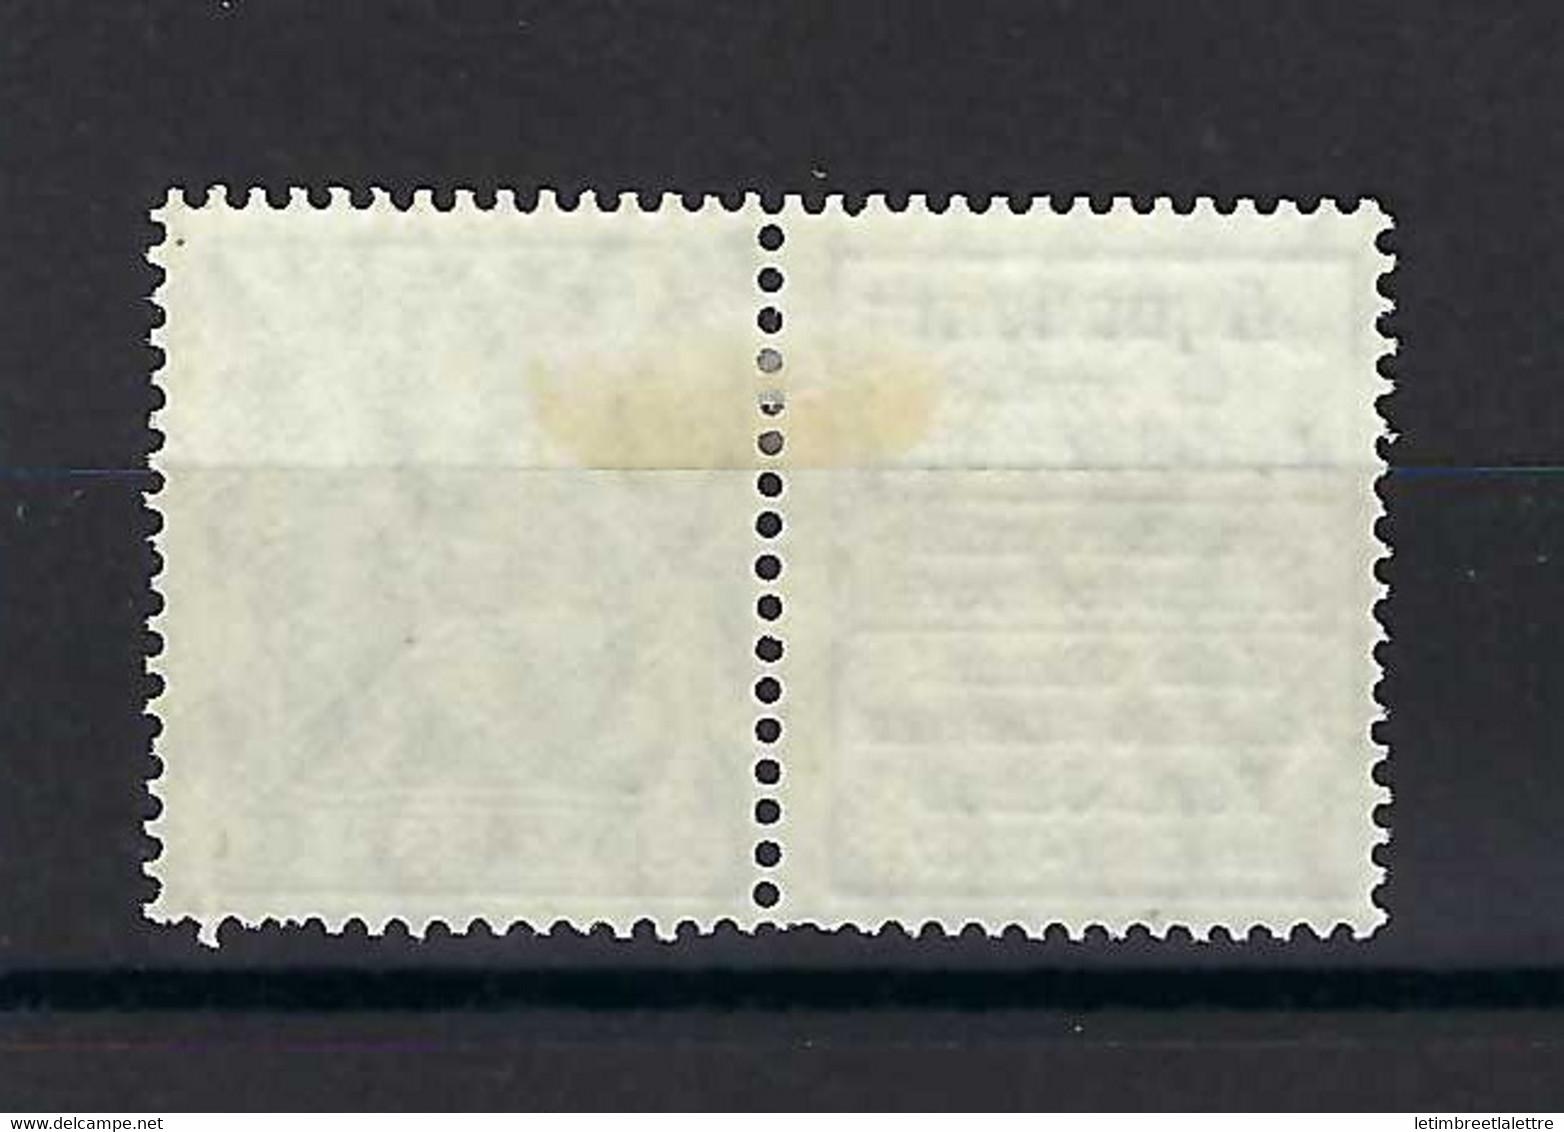 ⭐ Allemagne - Timbre Publicitaire - Michel N° W 2 . 12 * - Neuf Avec Charnière - Aquadent -> R 12 - 1911 / 1912 ⭐ - Germany